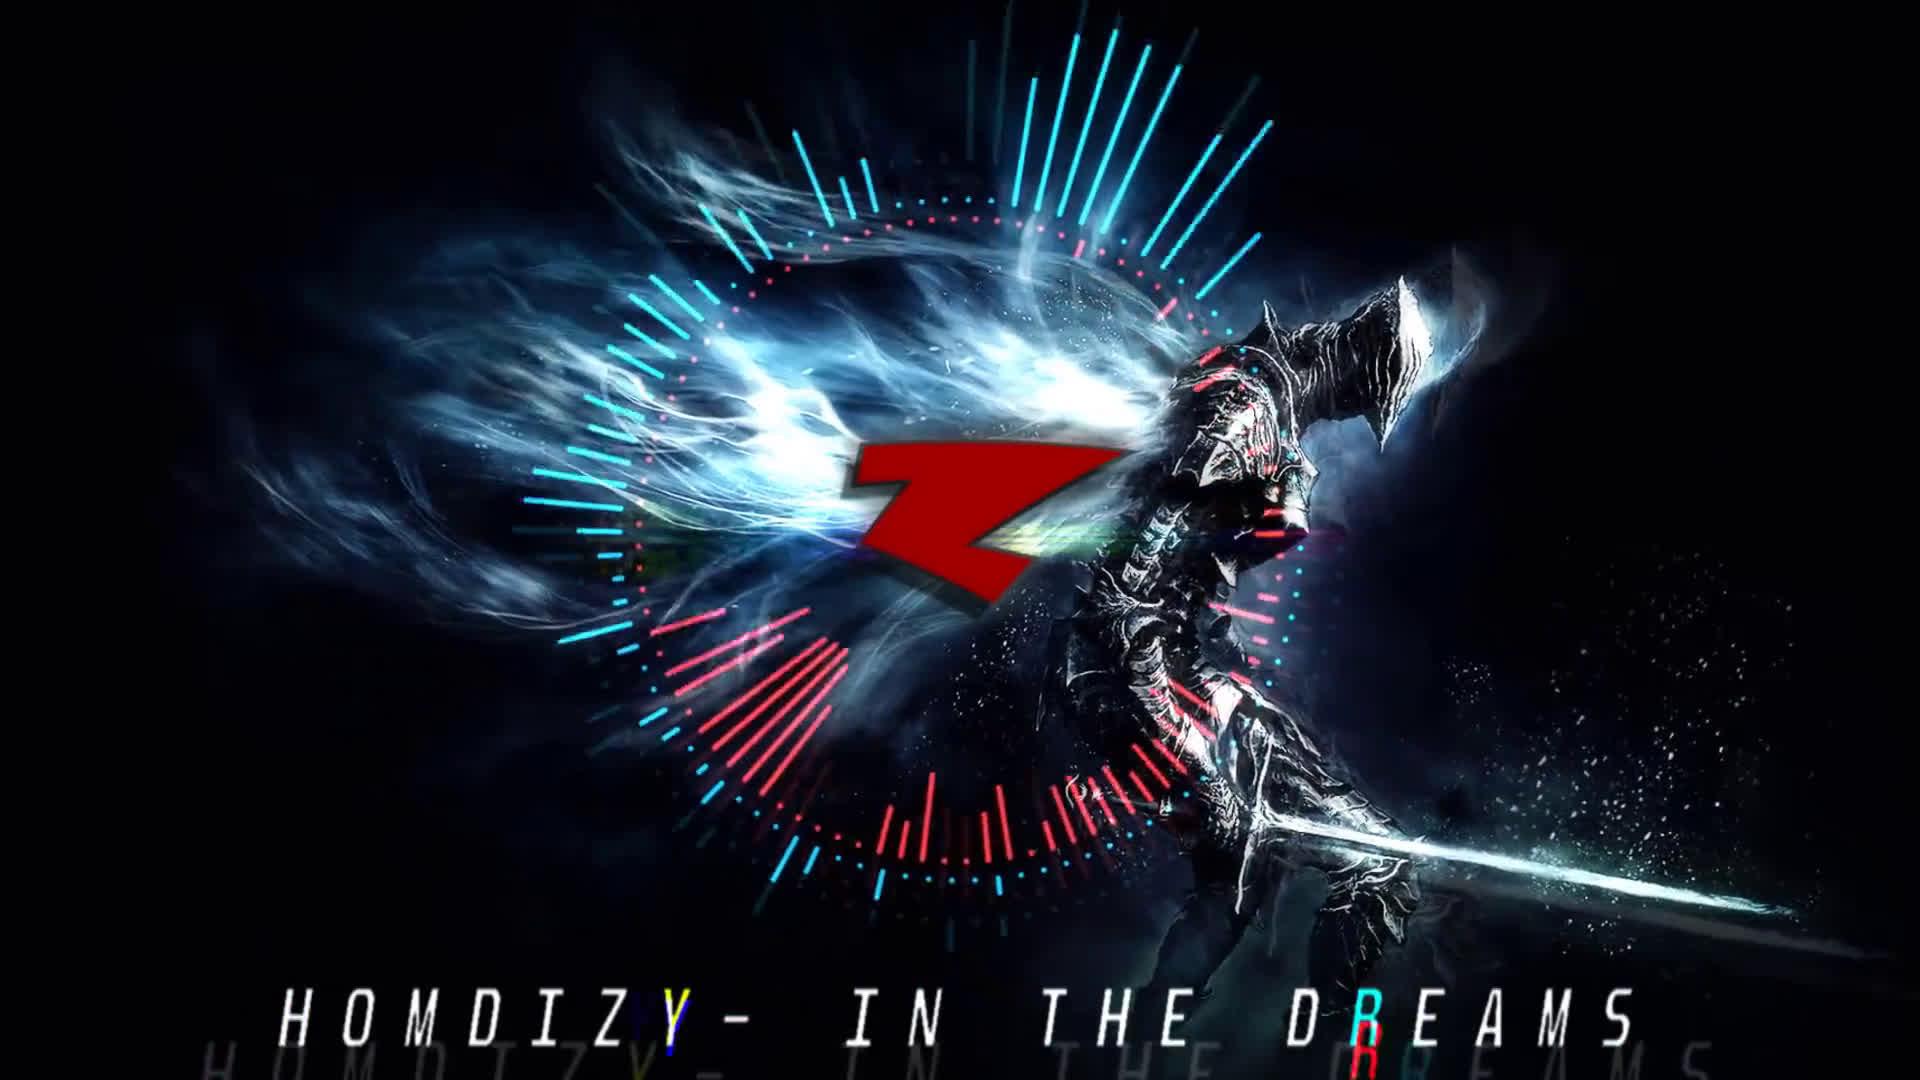 in the dreams- homdizy 原创黑暗系电音图片